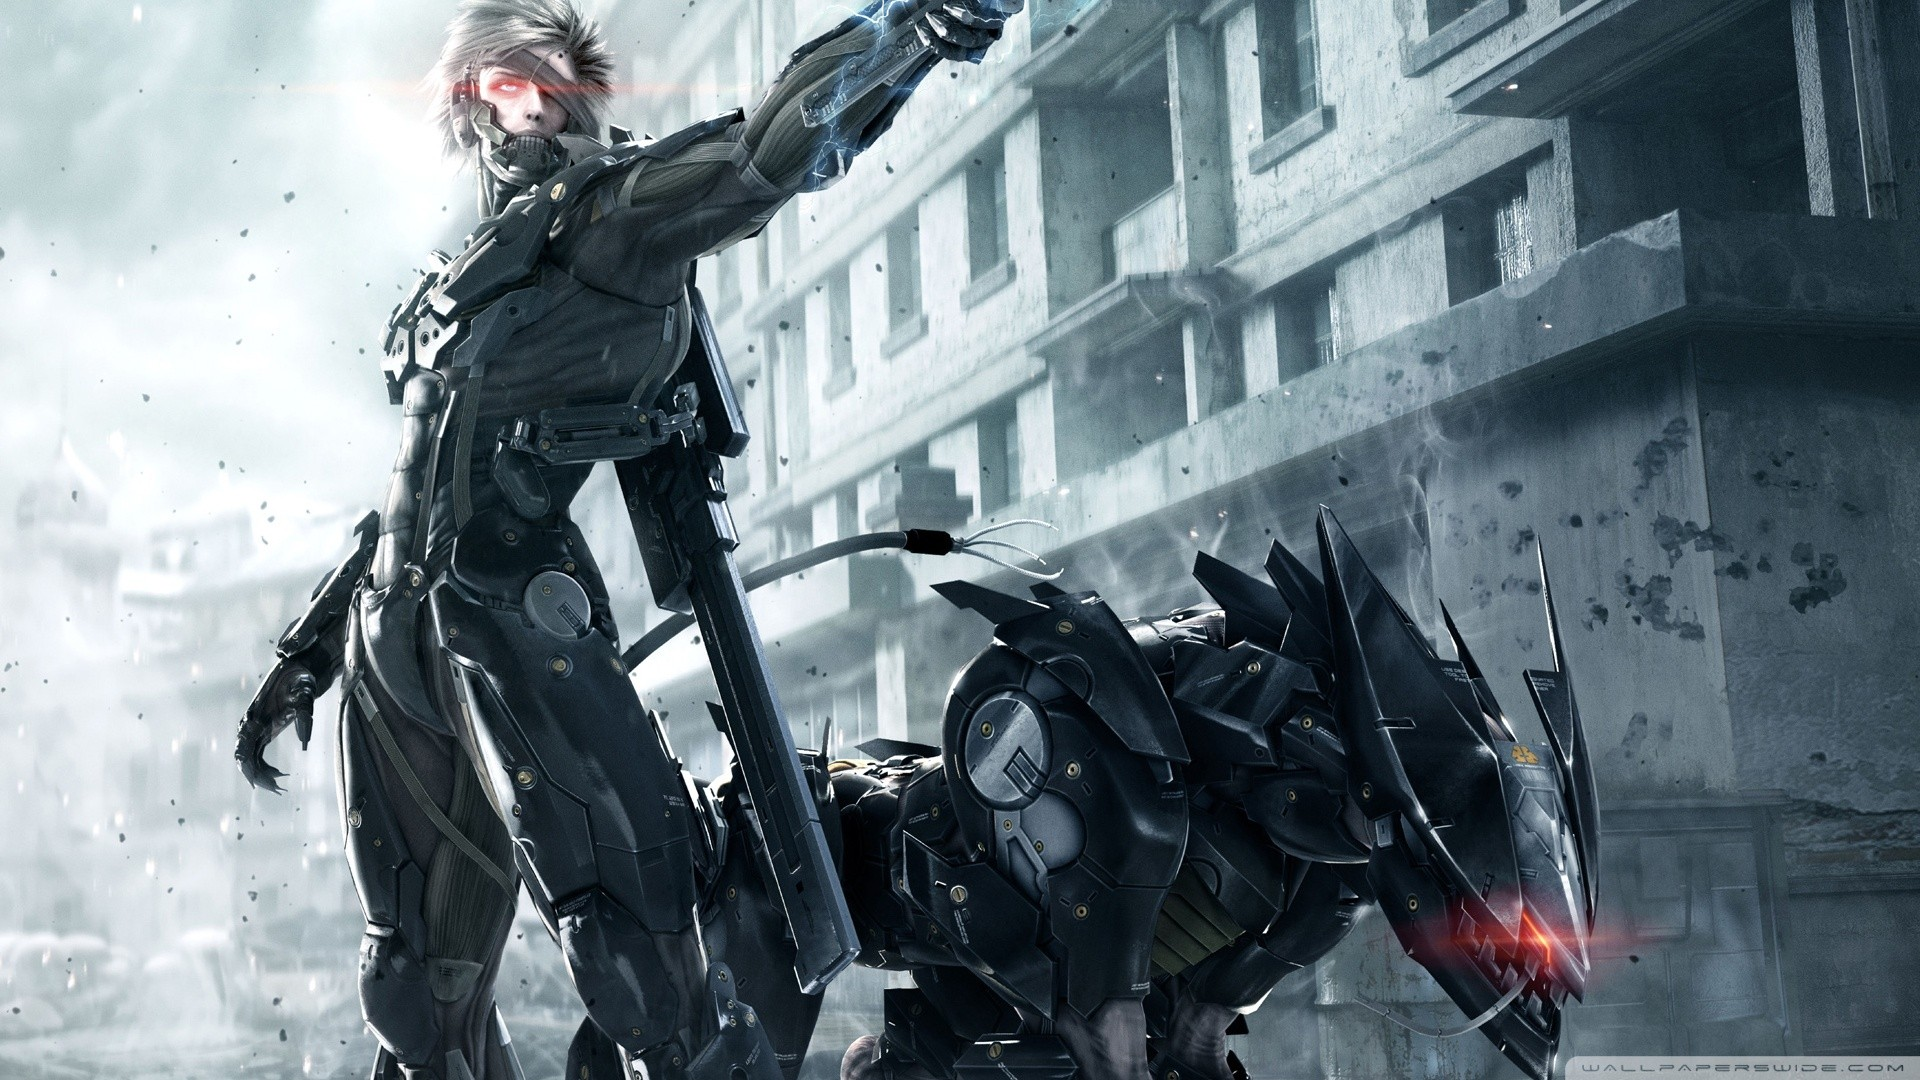 General 1920x1080 Metal Gear Rising: Revengeance futuristic Raiden Blade Wolf 2013 (Year) video game art video games science fiction